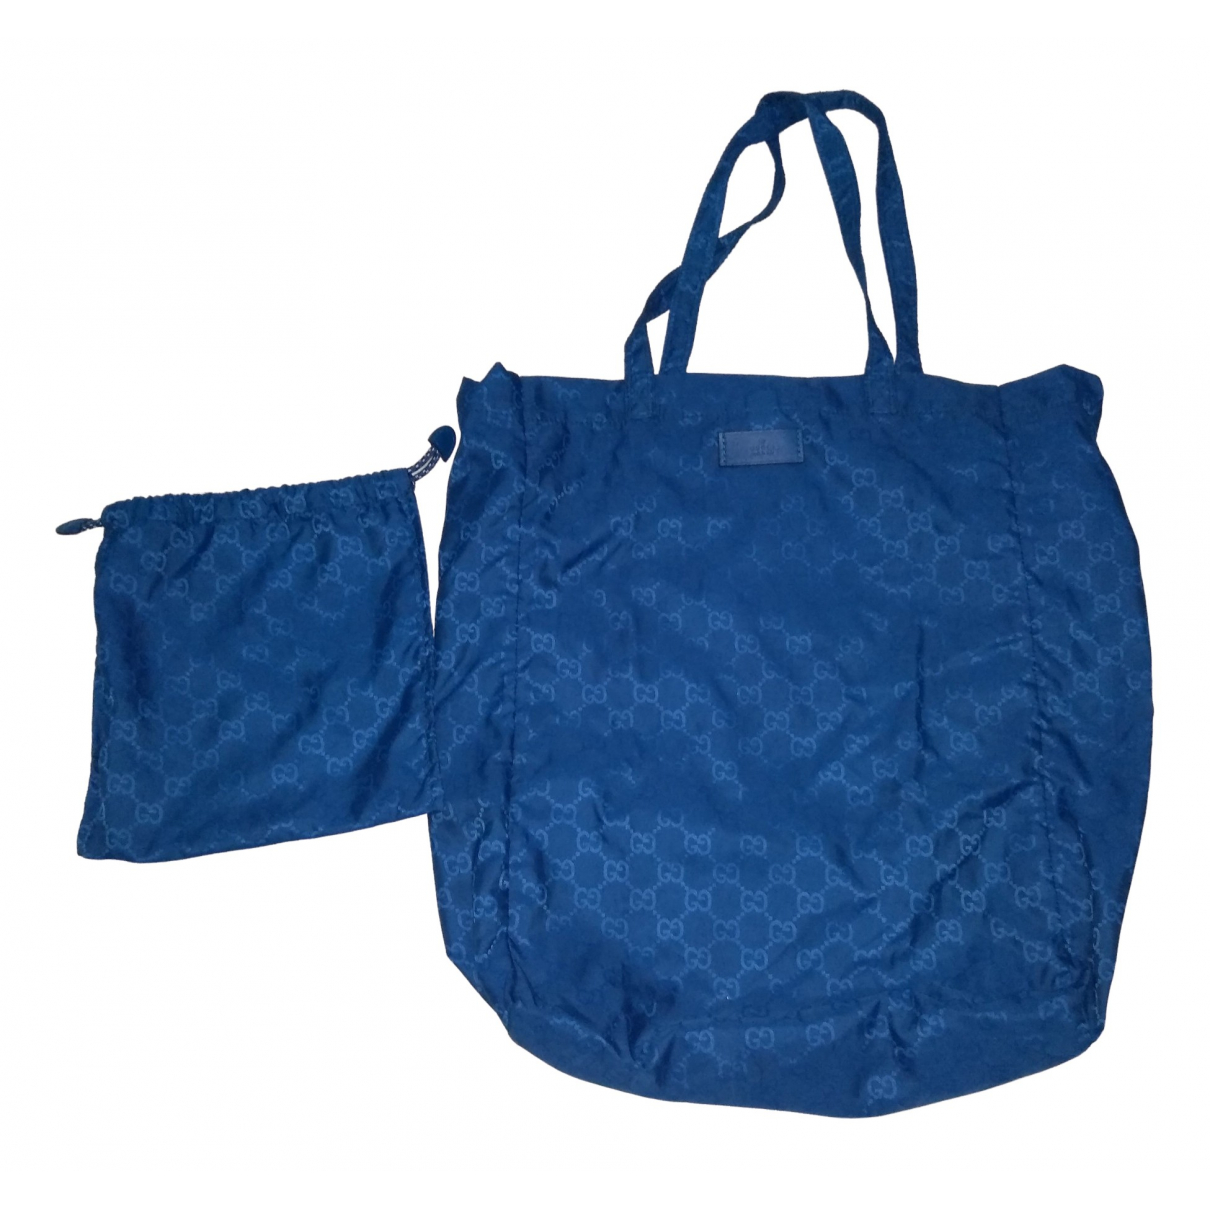 Gucci \N Blue Travel bag for Women \N